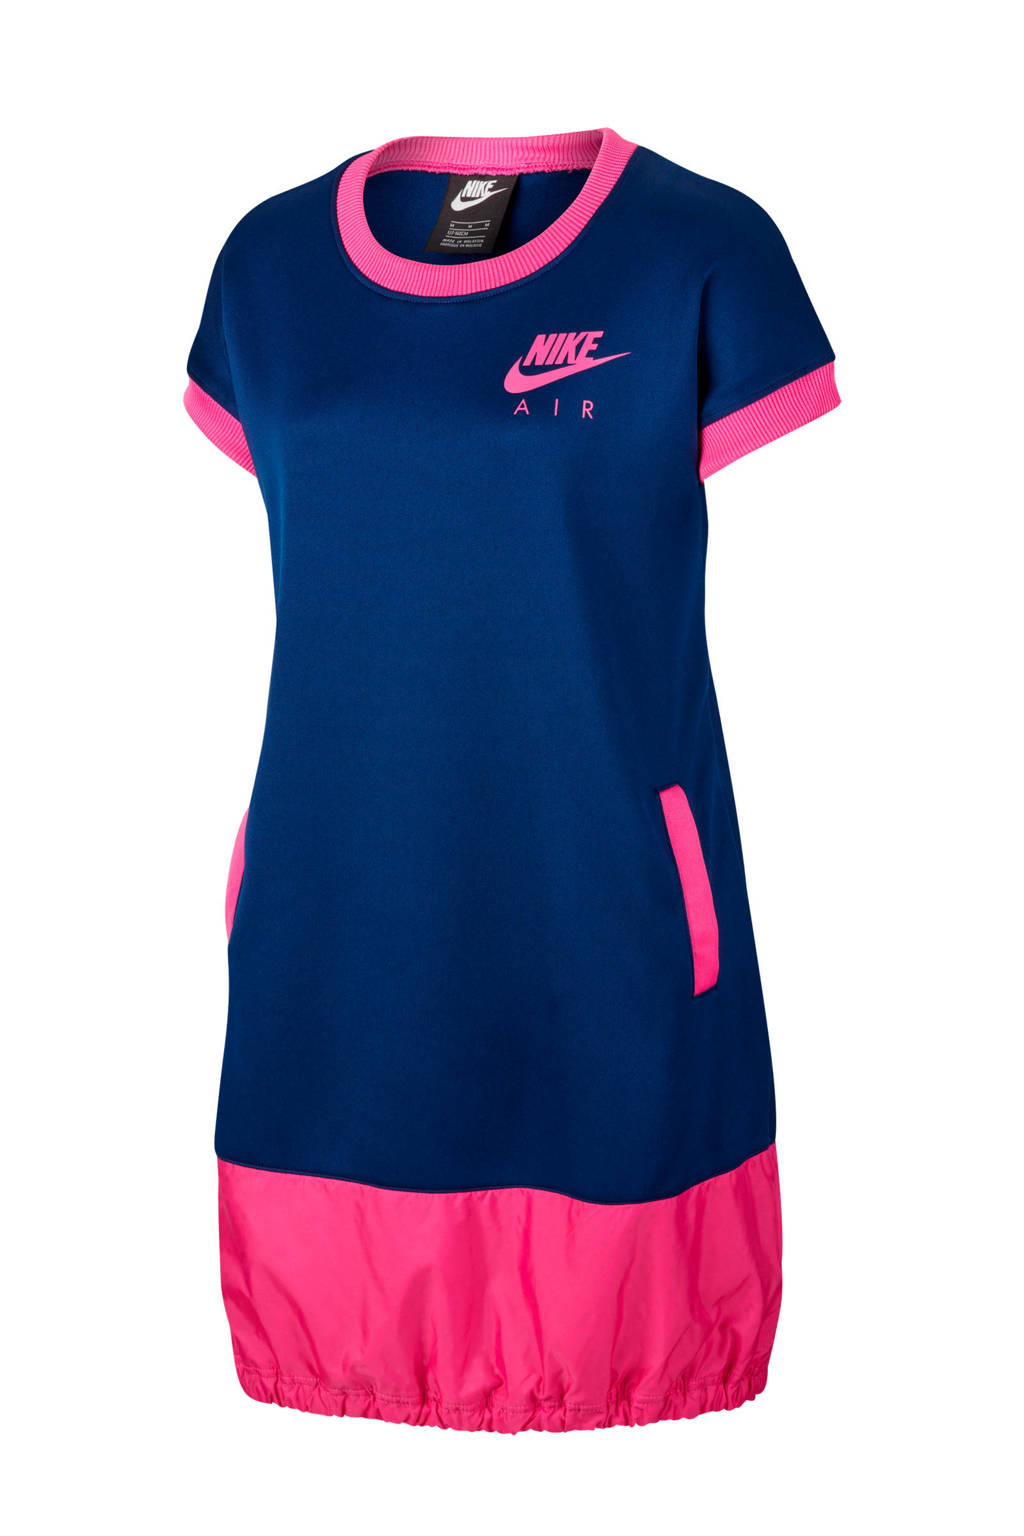 Nike Air T-shirt jurk donkerblauw/roze, Donkerblauw/roze